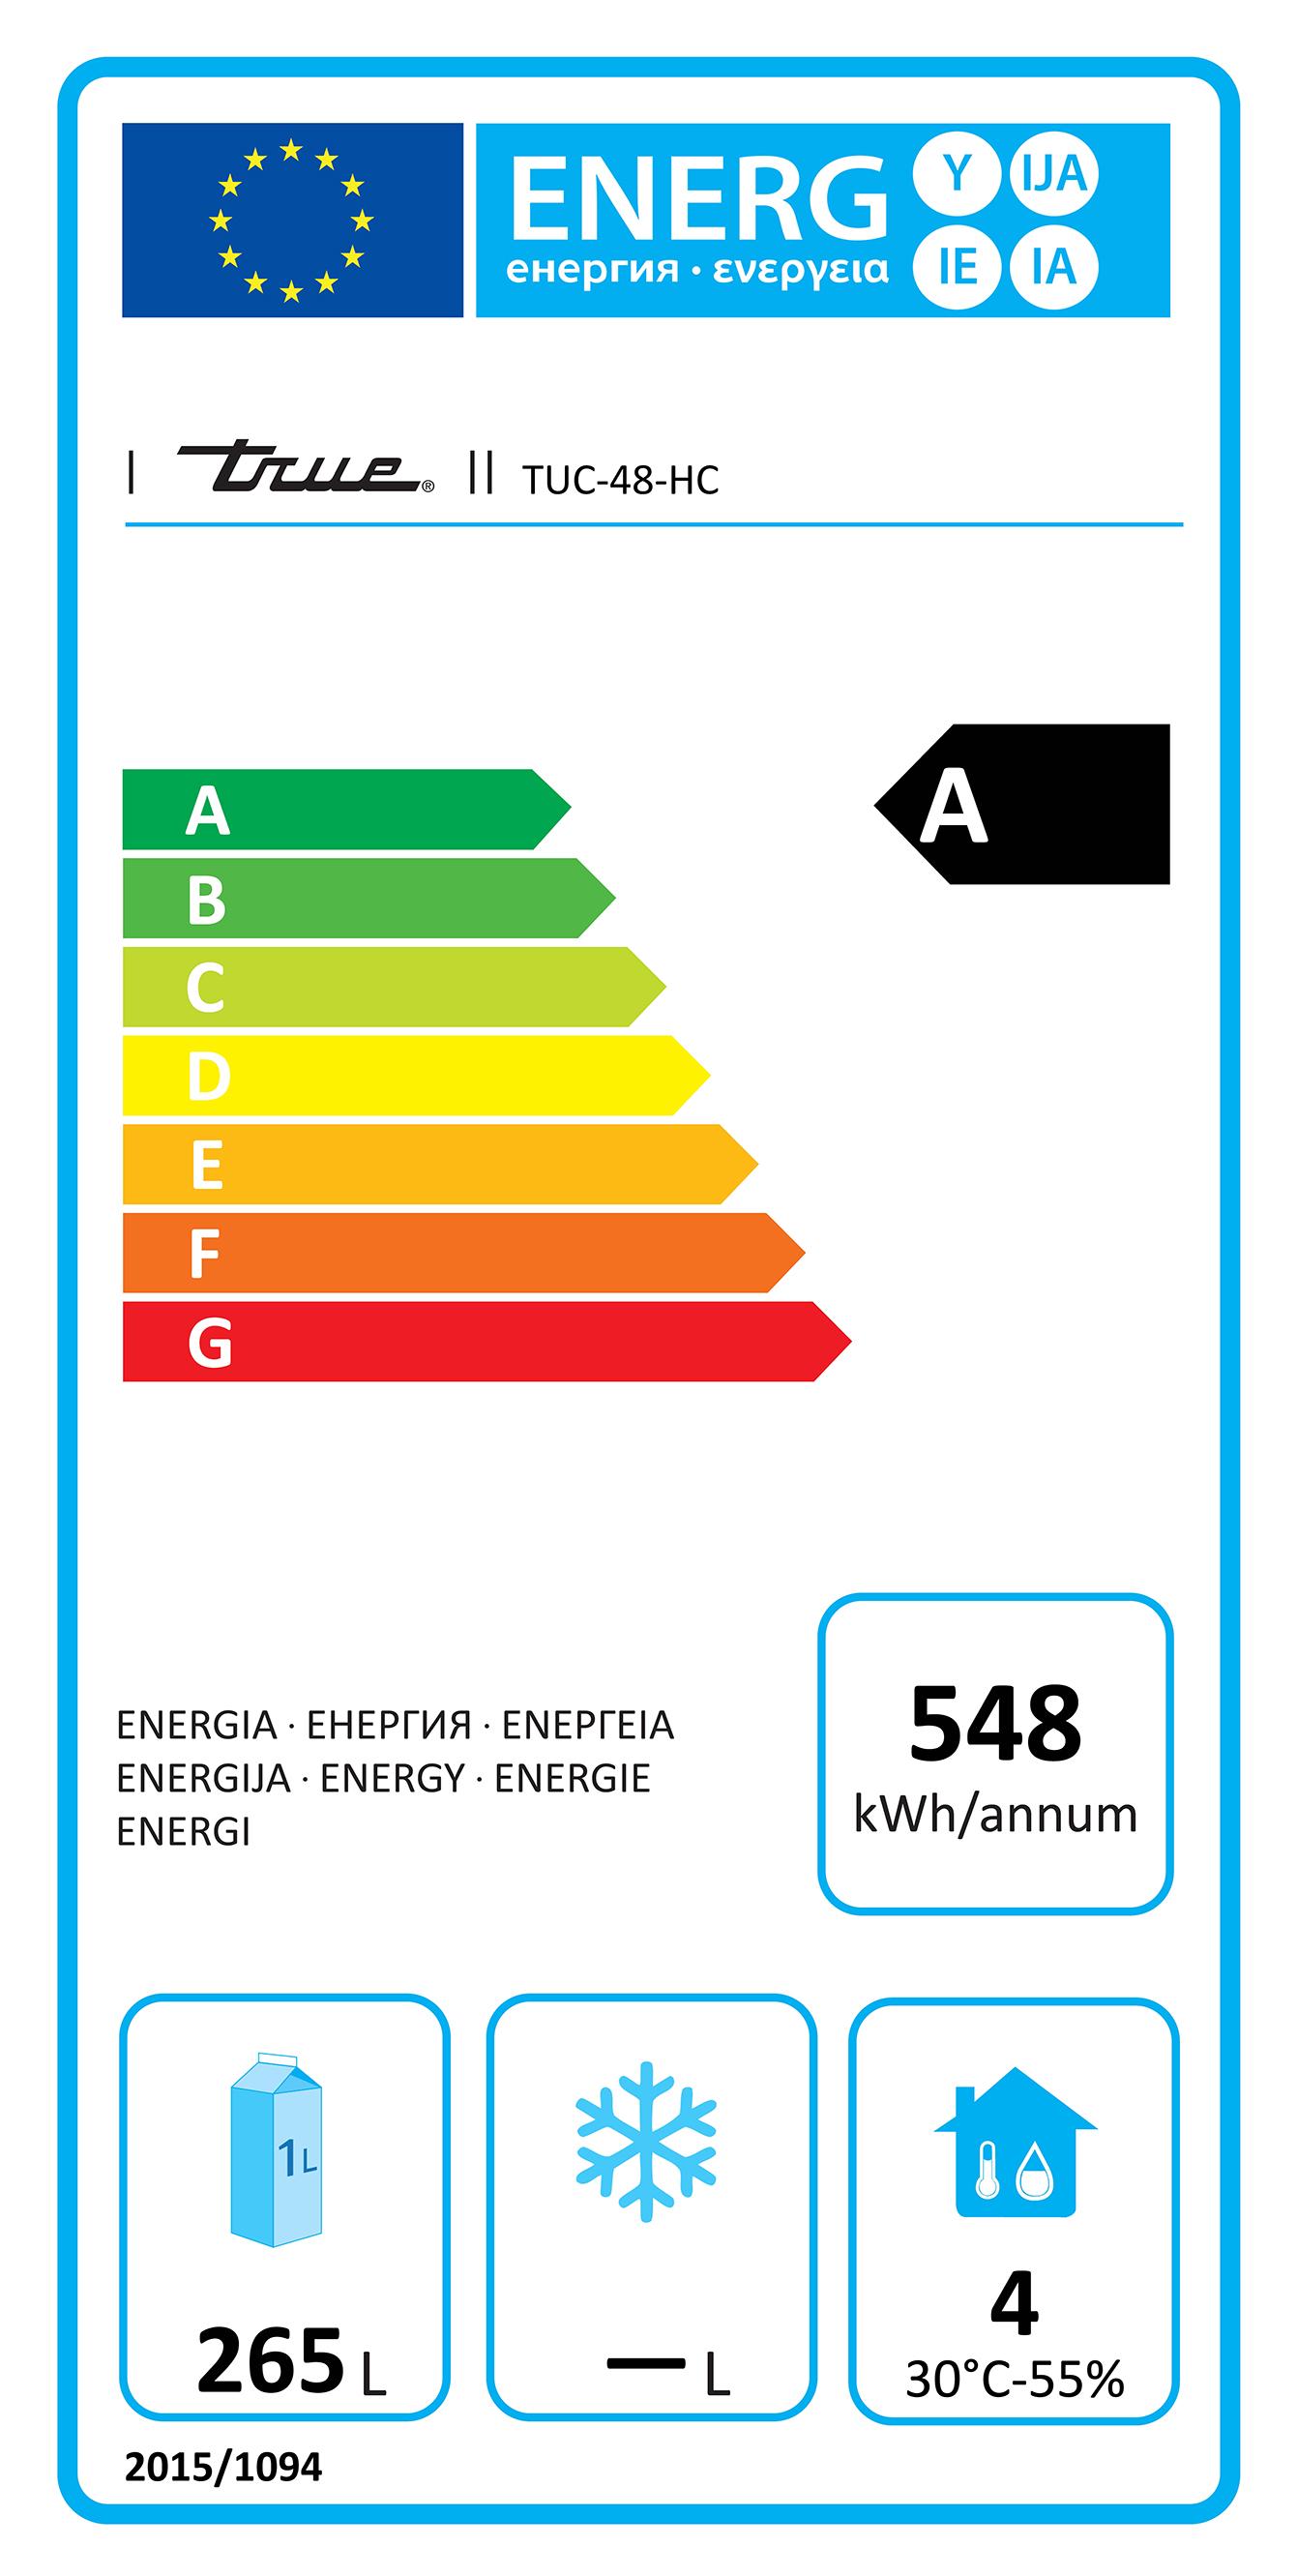 TUC-48-HC 340 Ltr Hydrocarbon Undercounter Fridge Energy Rating